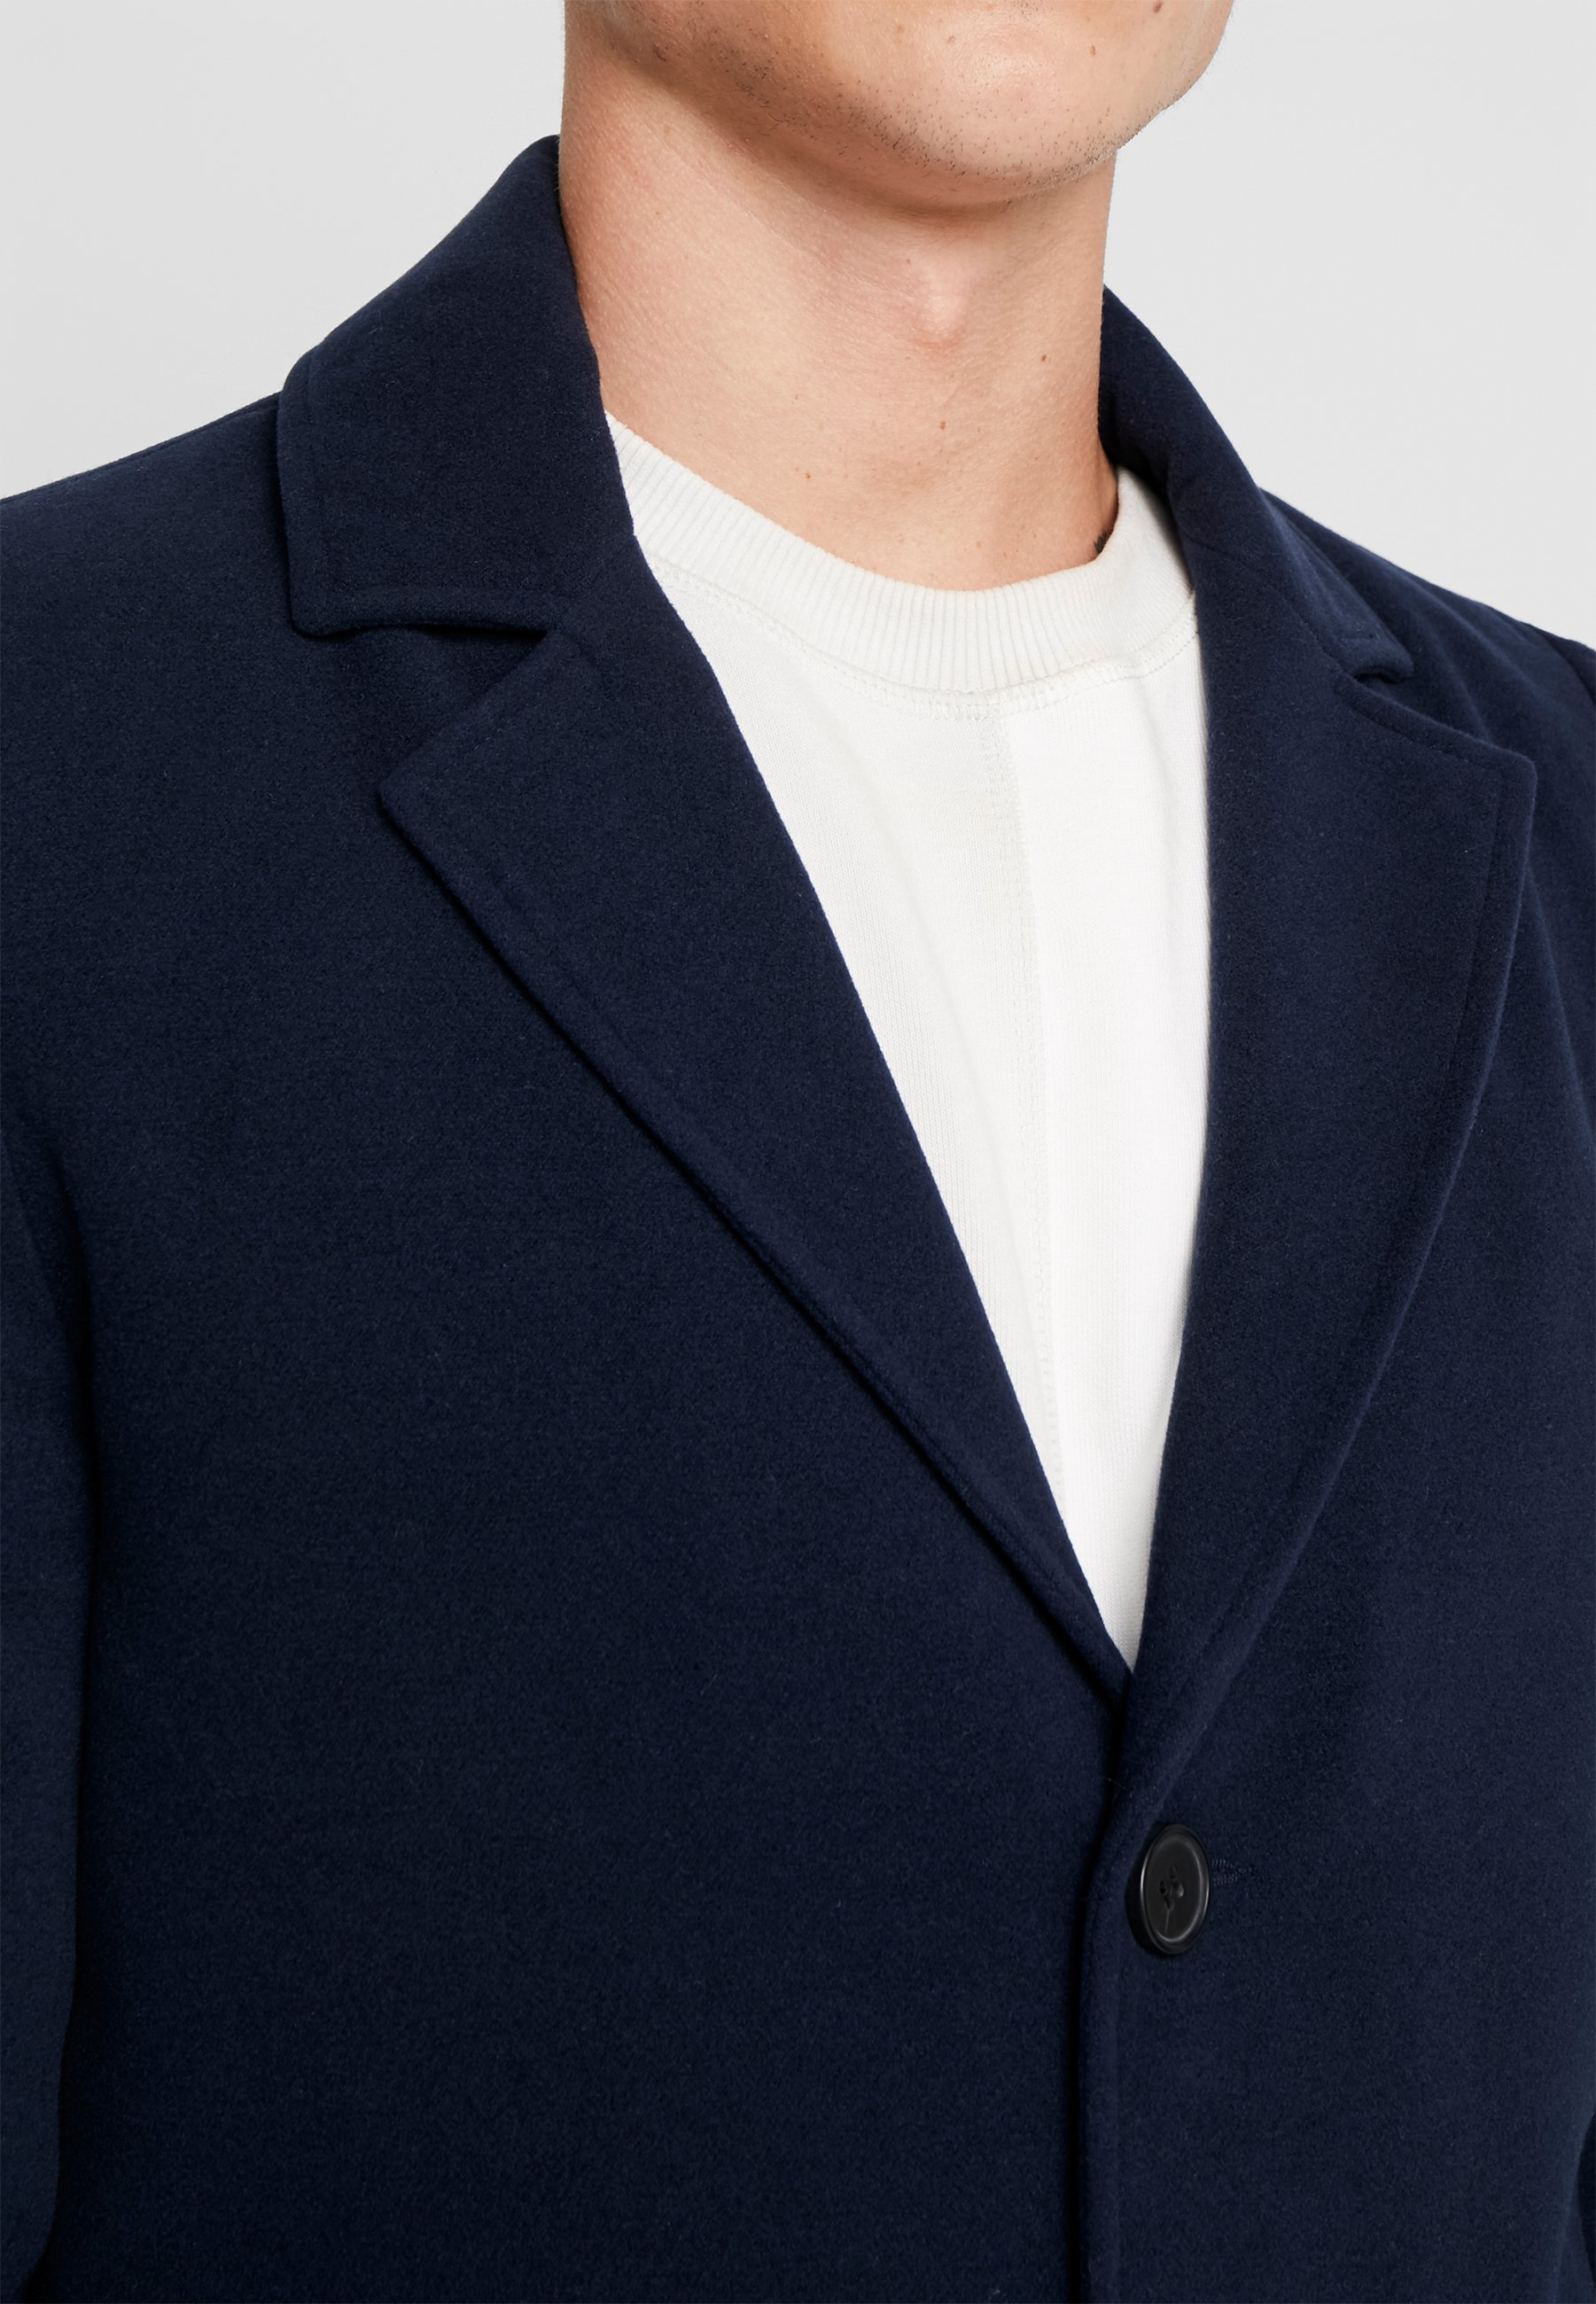 Classique Navy Boohoo OvercoatManteau Breasted Single Man ZukOiPX